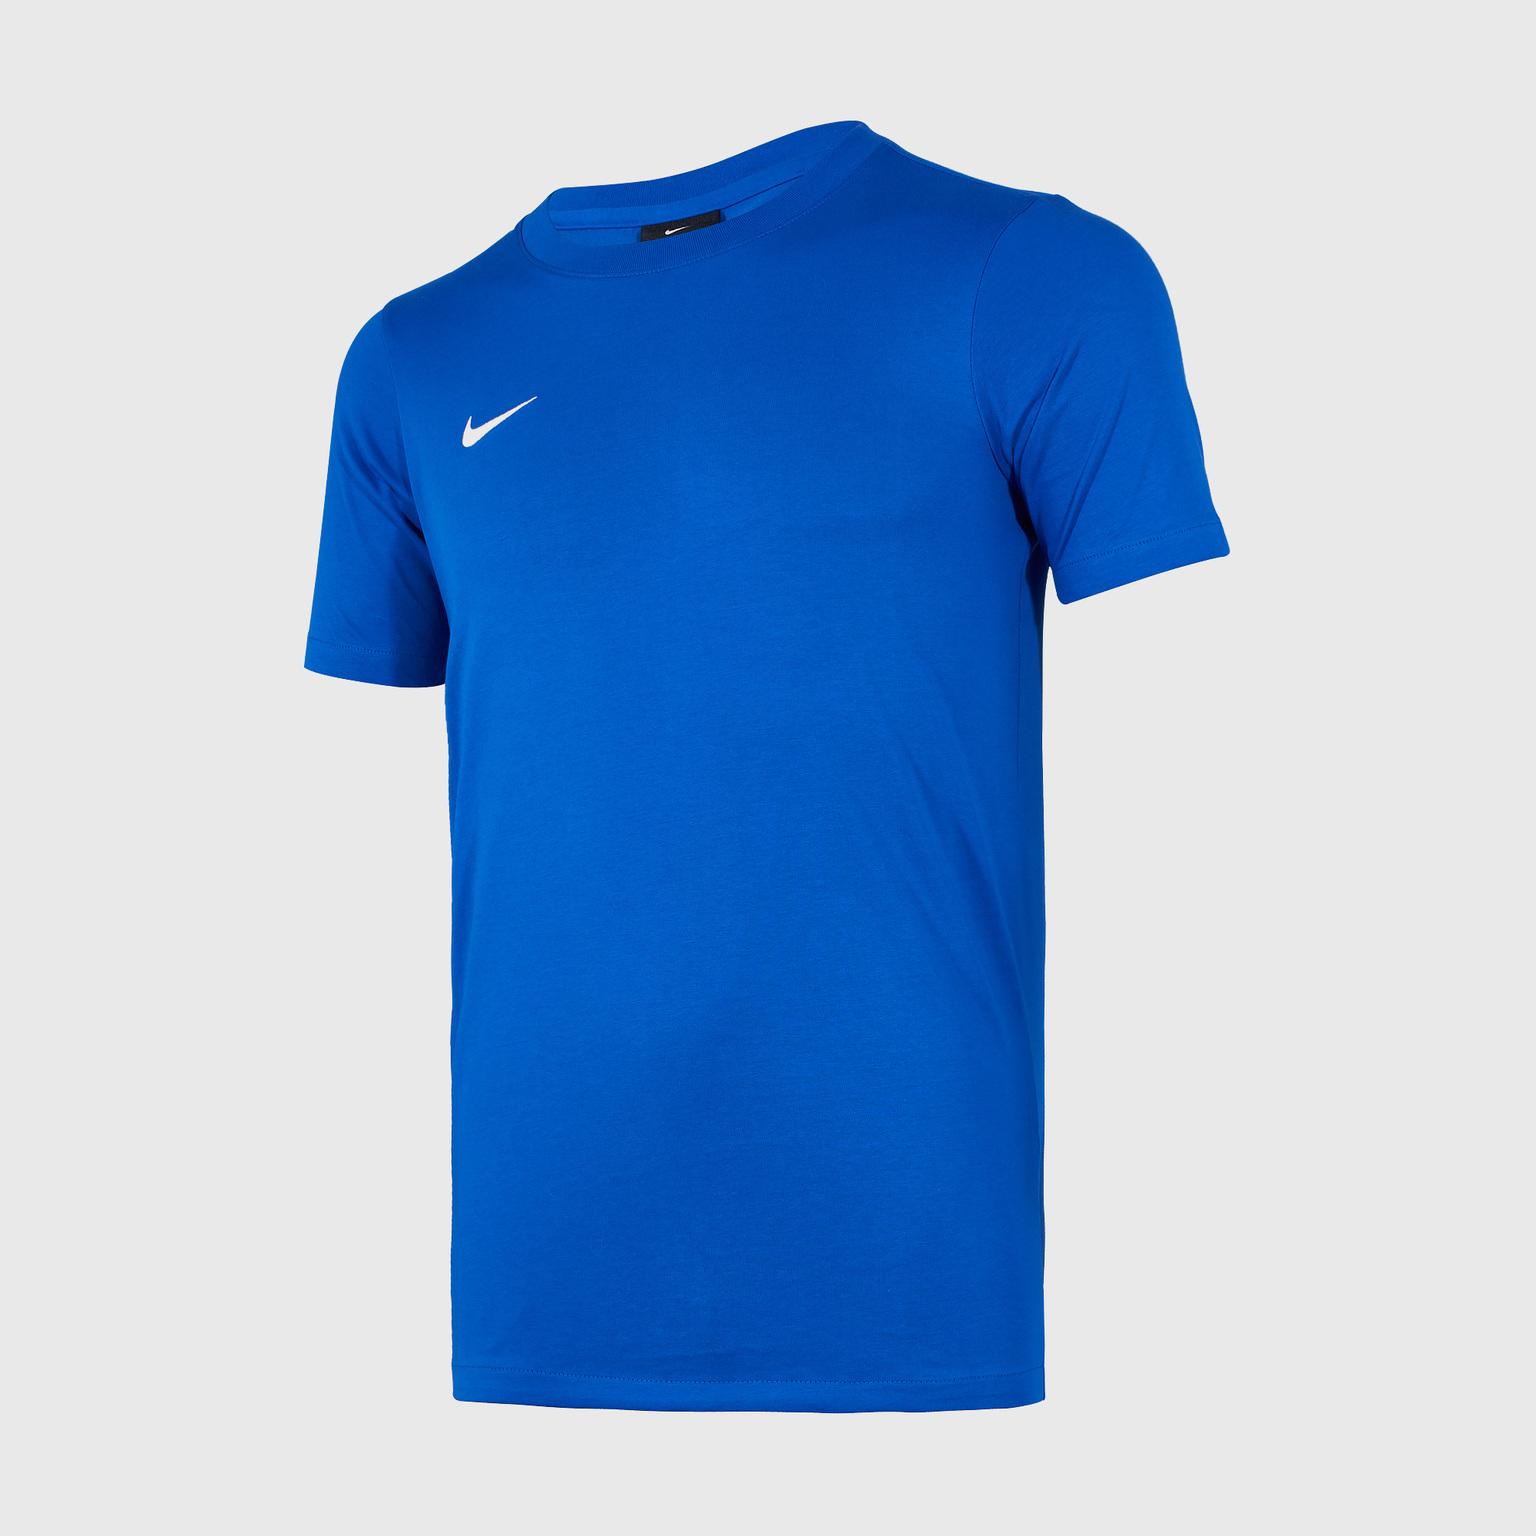 Футболка тренировочная подростковая Nike Tee Club19 SS AJ1548-463 футболка подростковая nike team club blend tee 658494 451